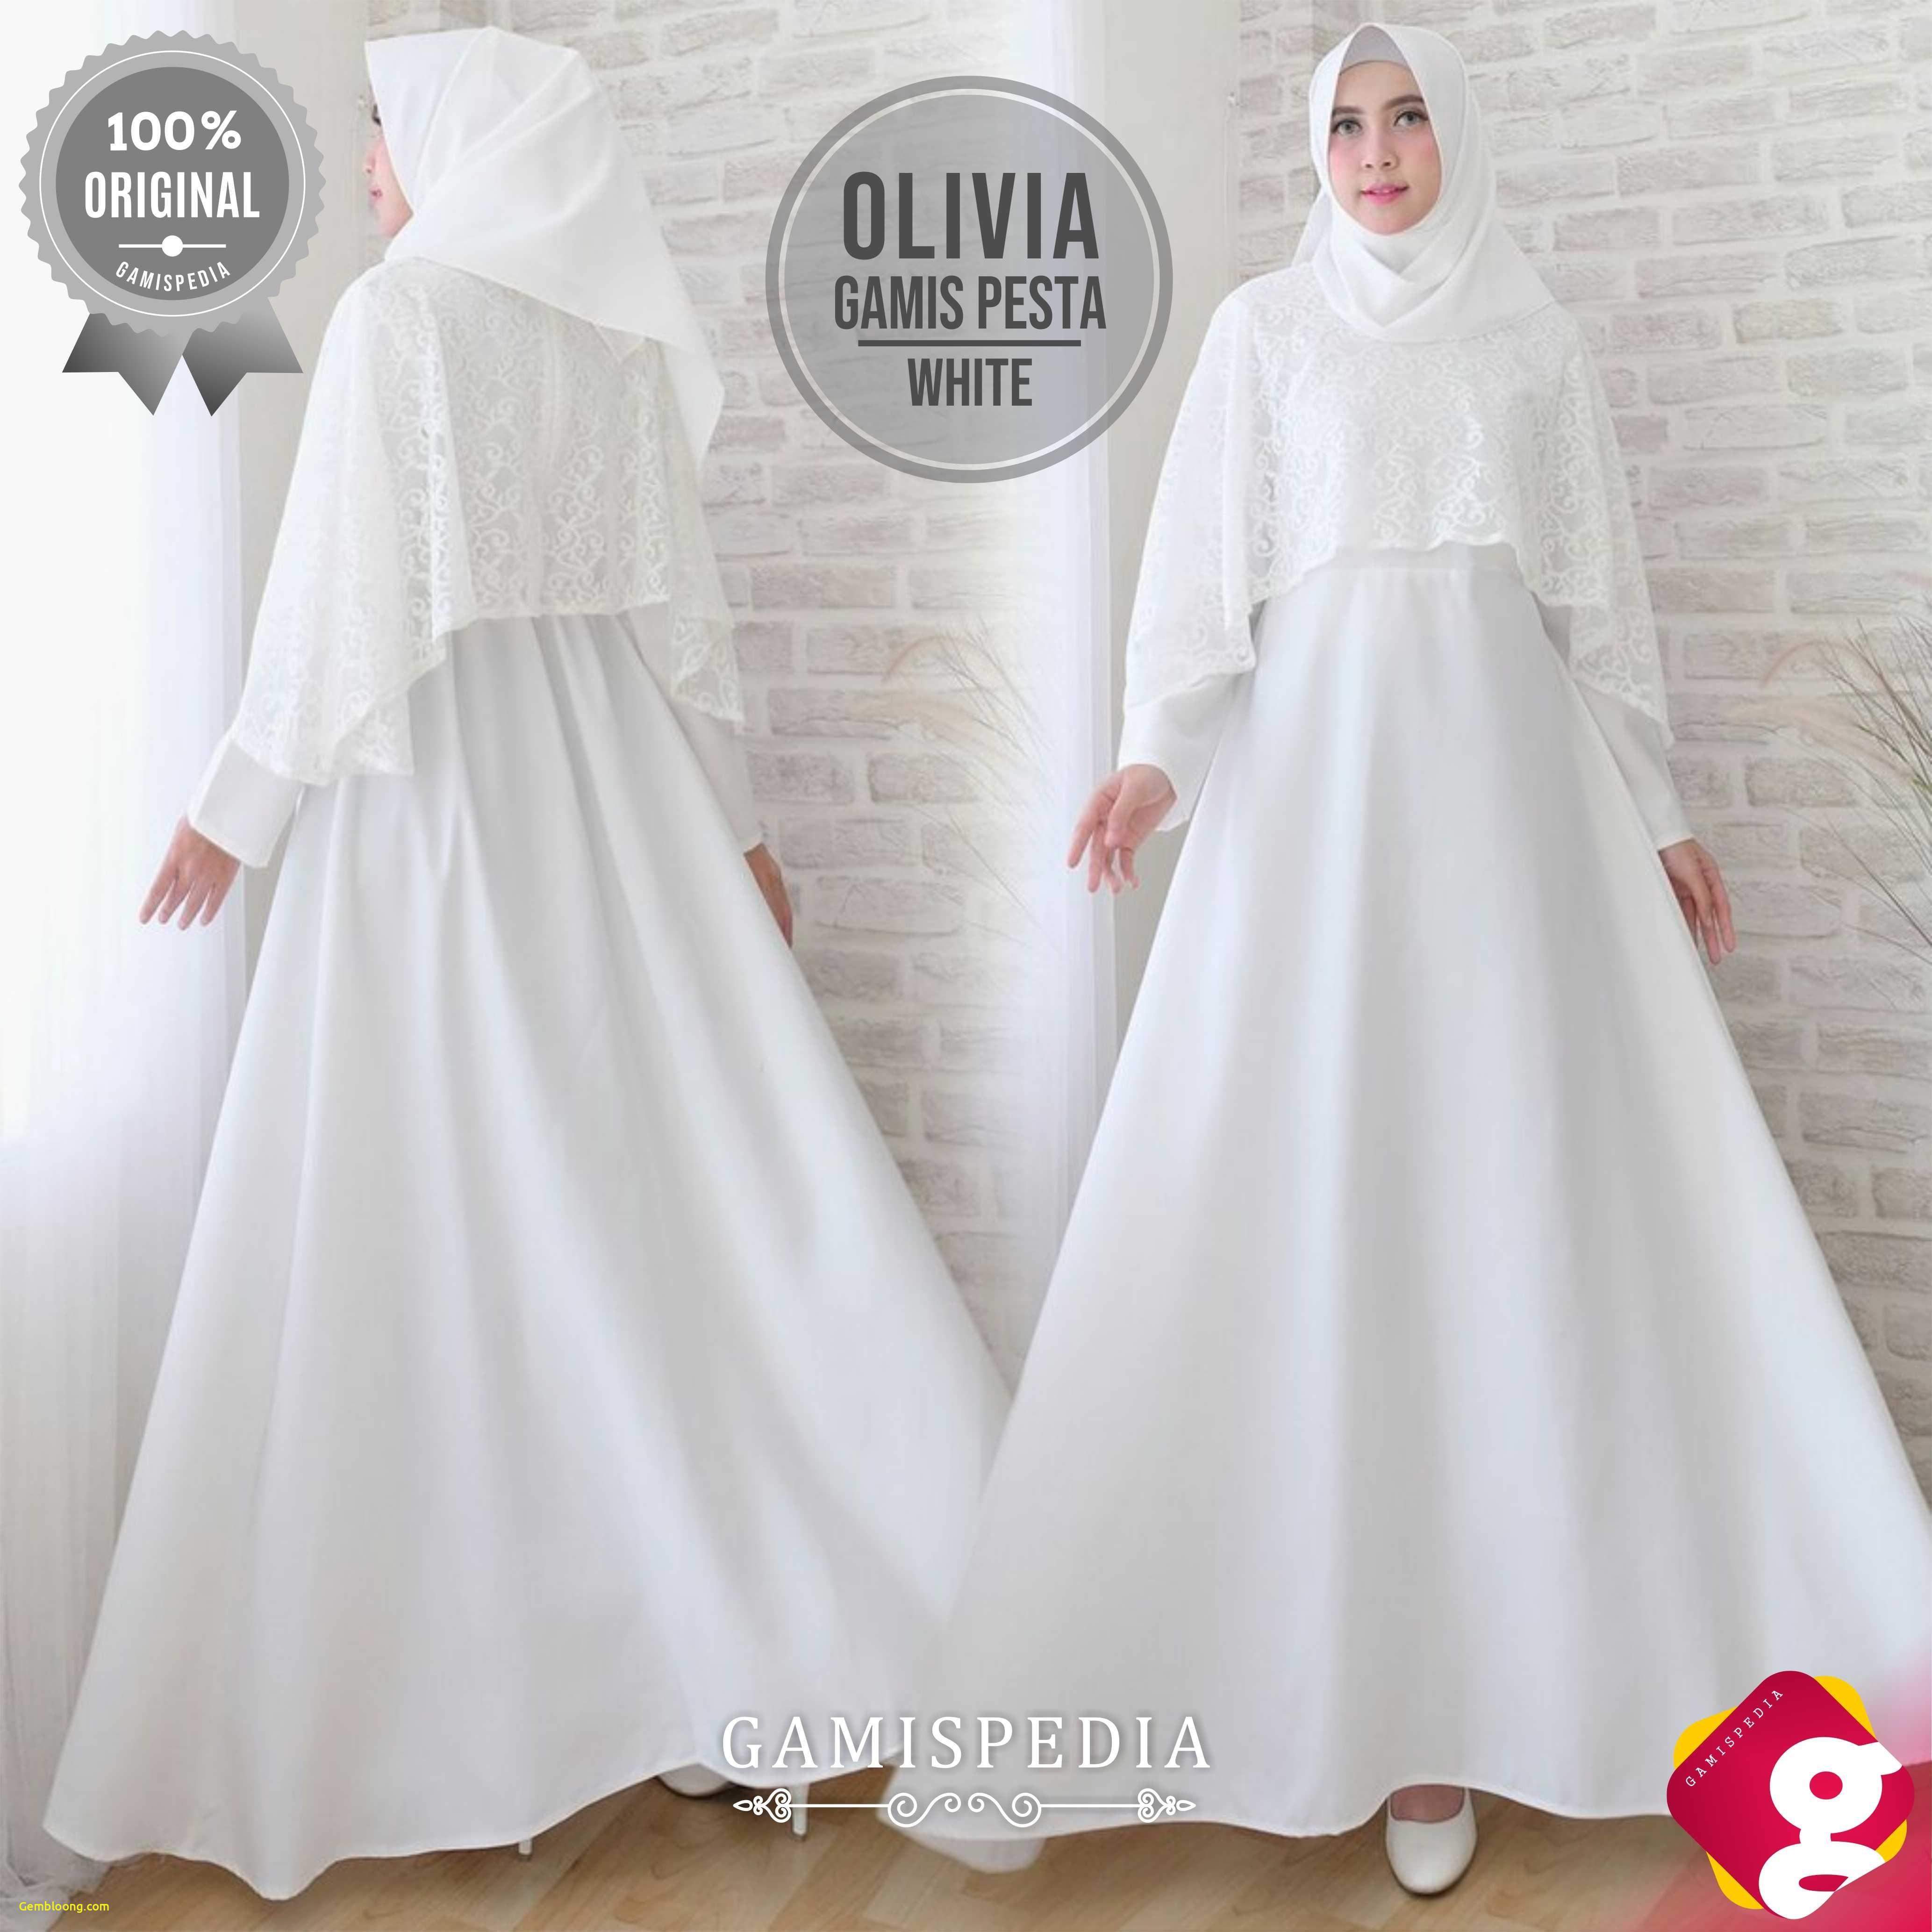 Gaun Pengantin Berhijab Unique Harga Gaun Pengantin Muslimah Wow Harga Kebaya Pengantin